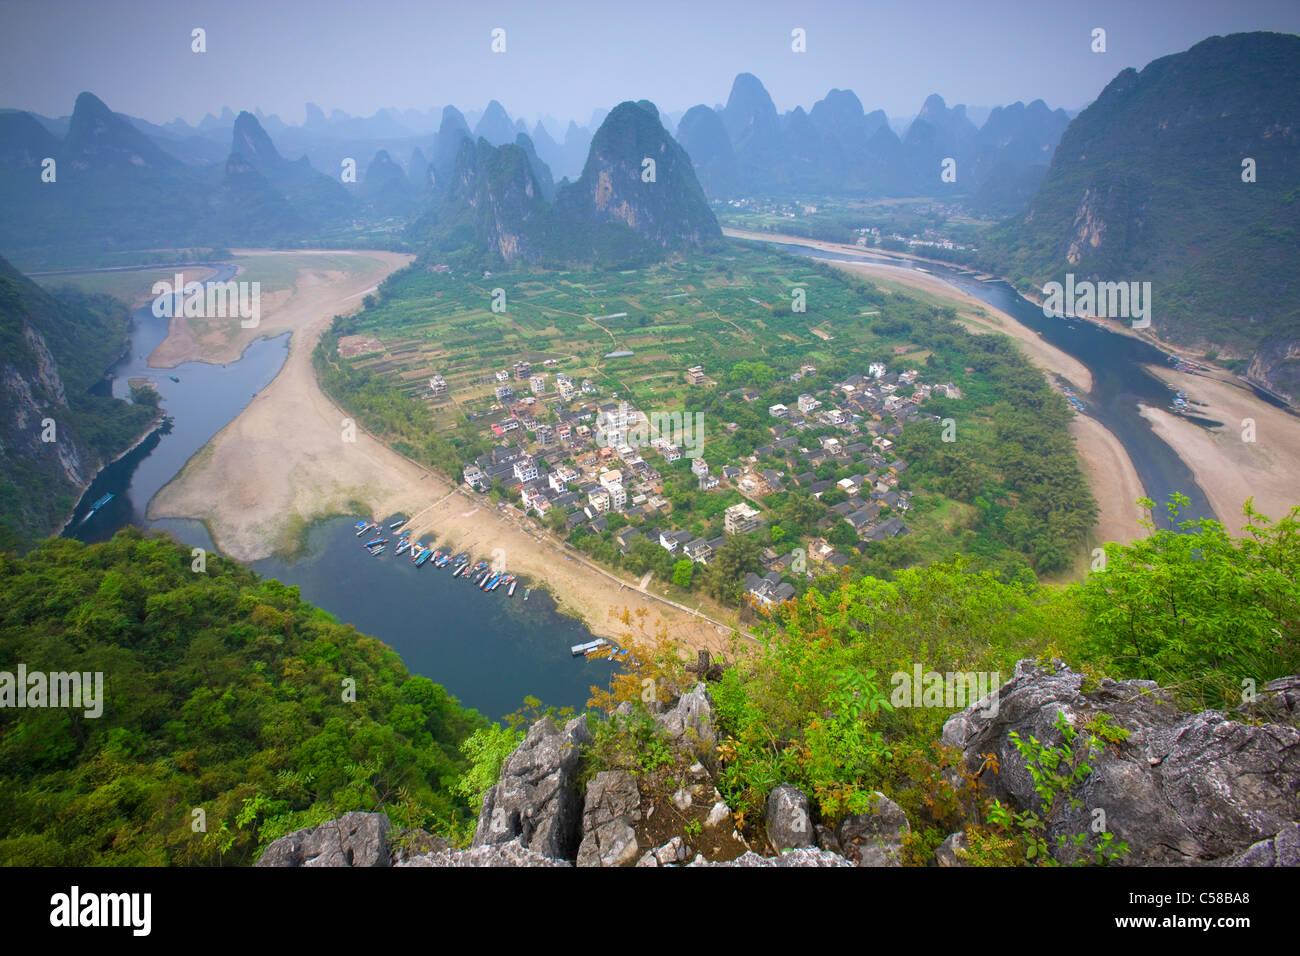 Li River, China, Asien, Fluss, Fluss, Flussschleife, Dorf, Boote, Berge, Karst, Karstlandschaft, Aussichtspunkt Stockbild